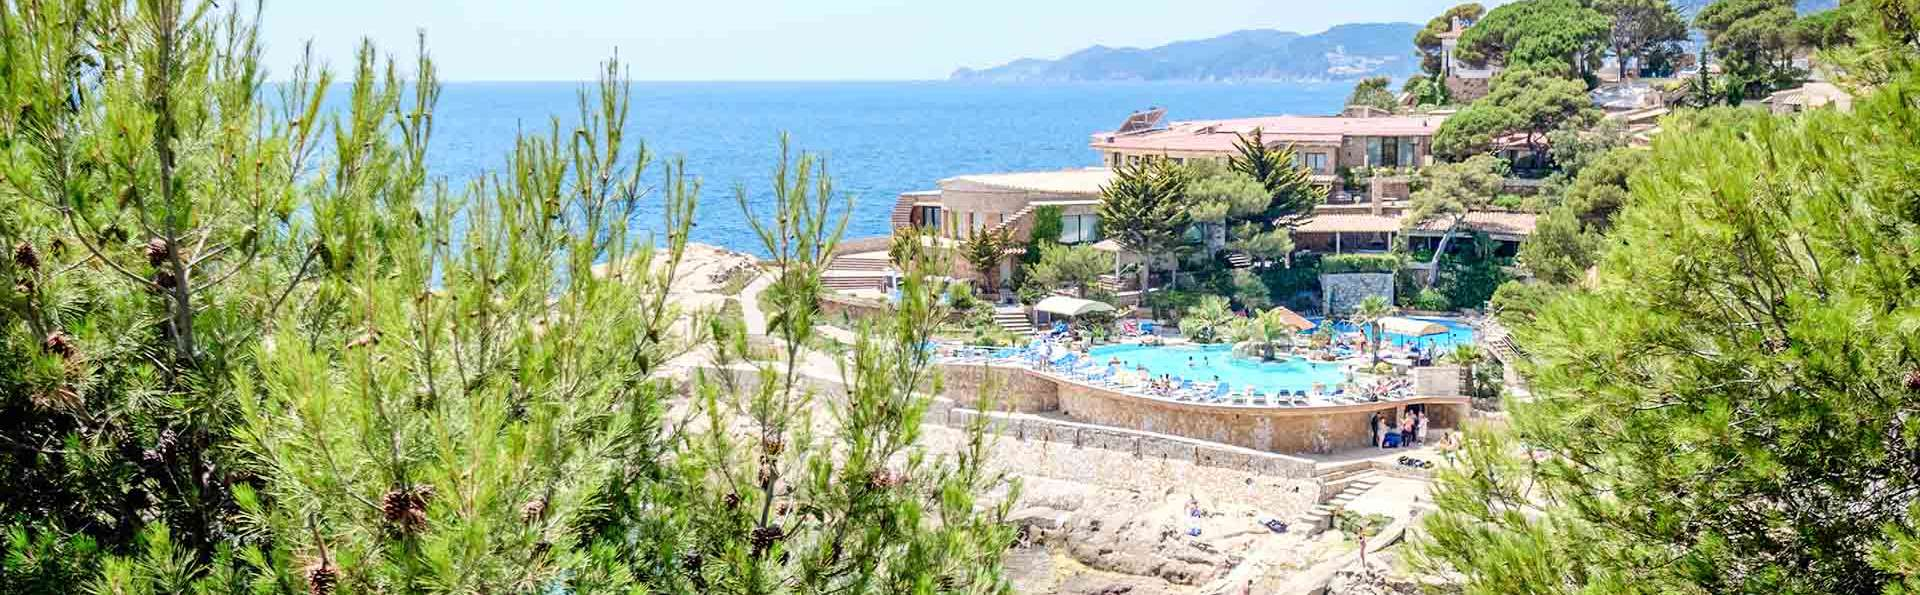 Hotel Eden Roc - EDIT_Seaside_resort_04.jpg